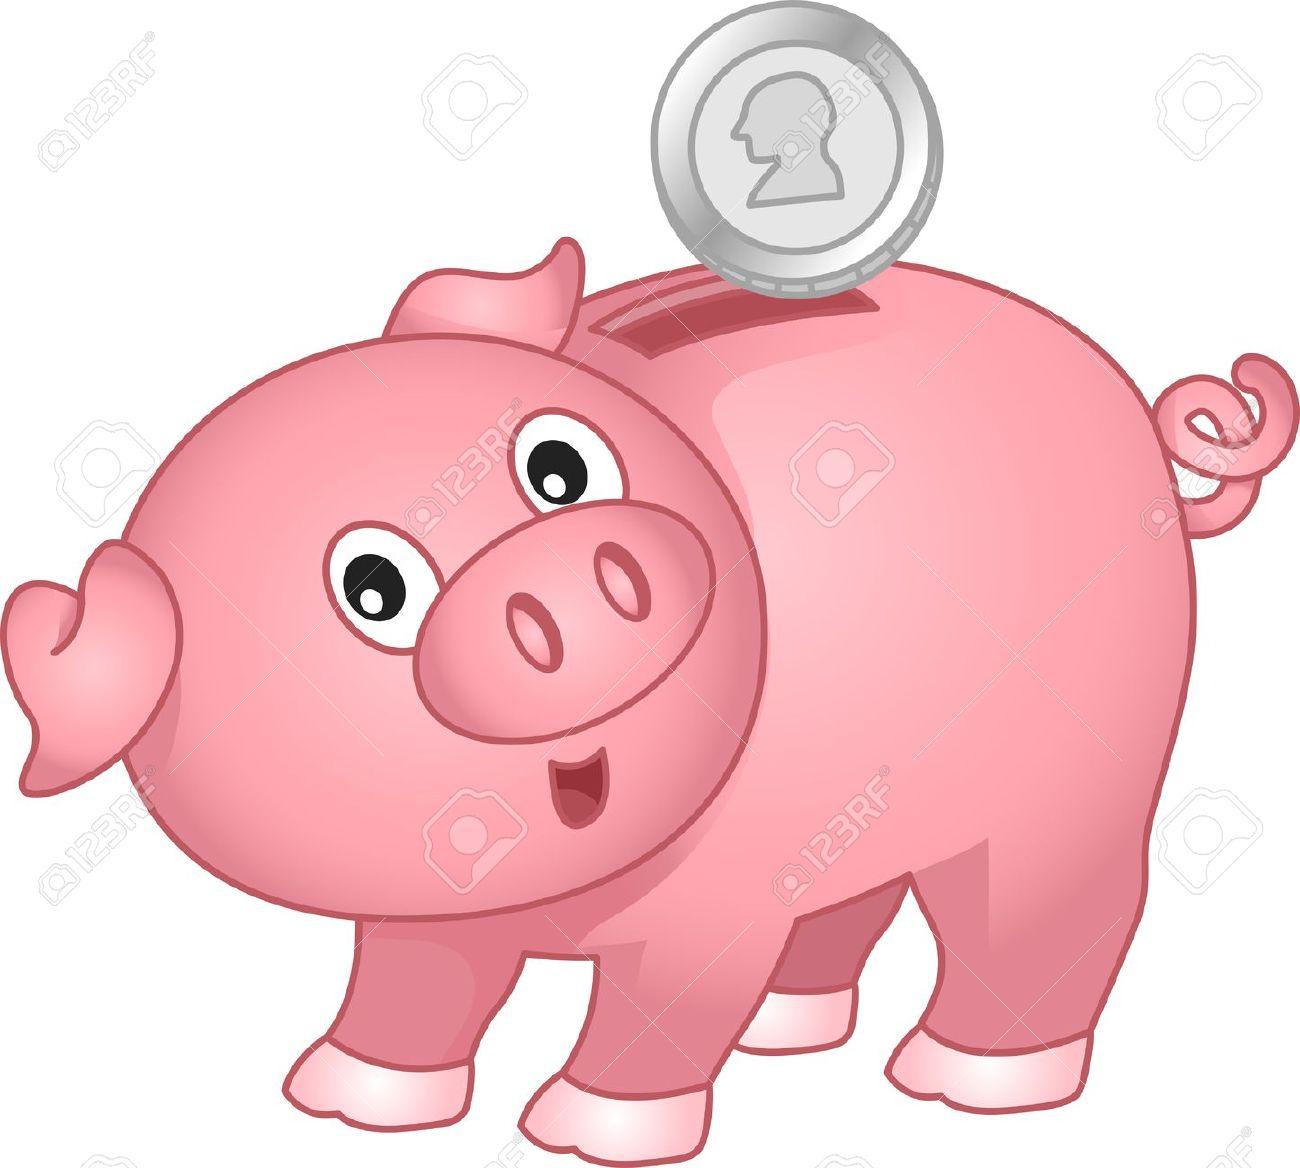 Hbcu Money S Top 10 Hbcu Endowments